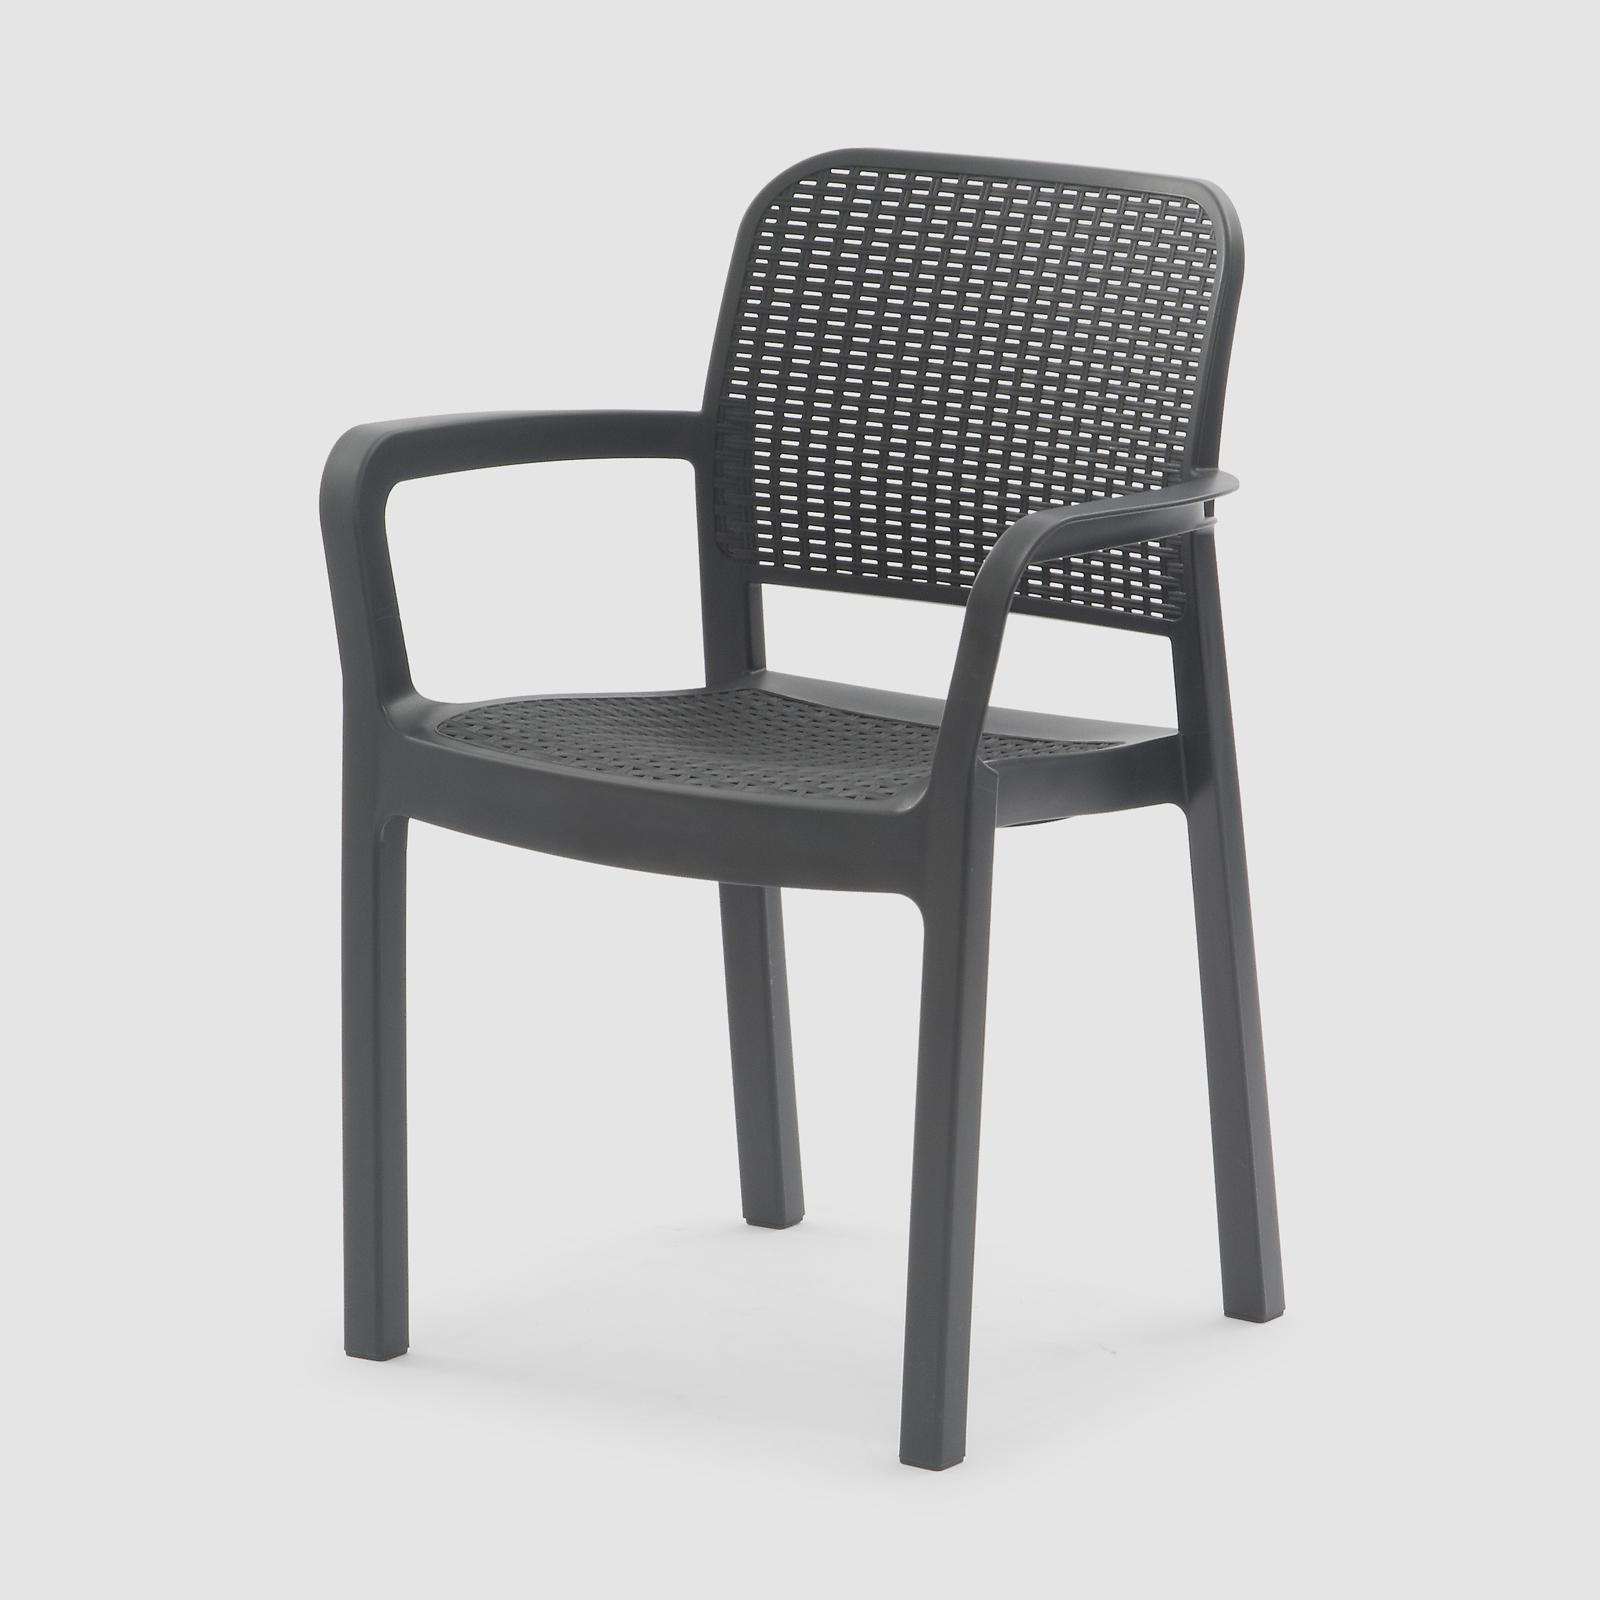 Allibert Samanna Graphite Rattan Dining Chair